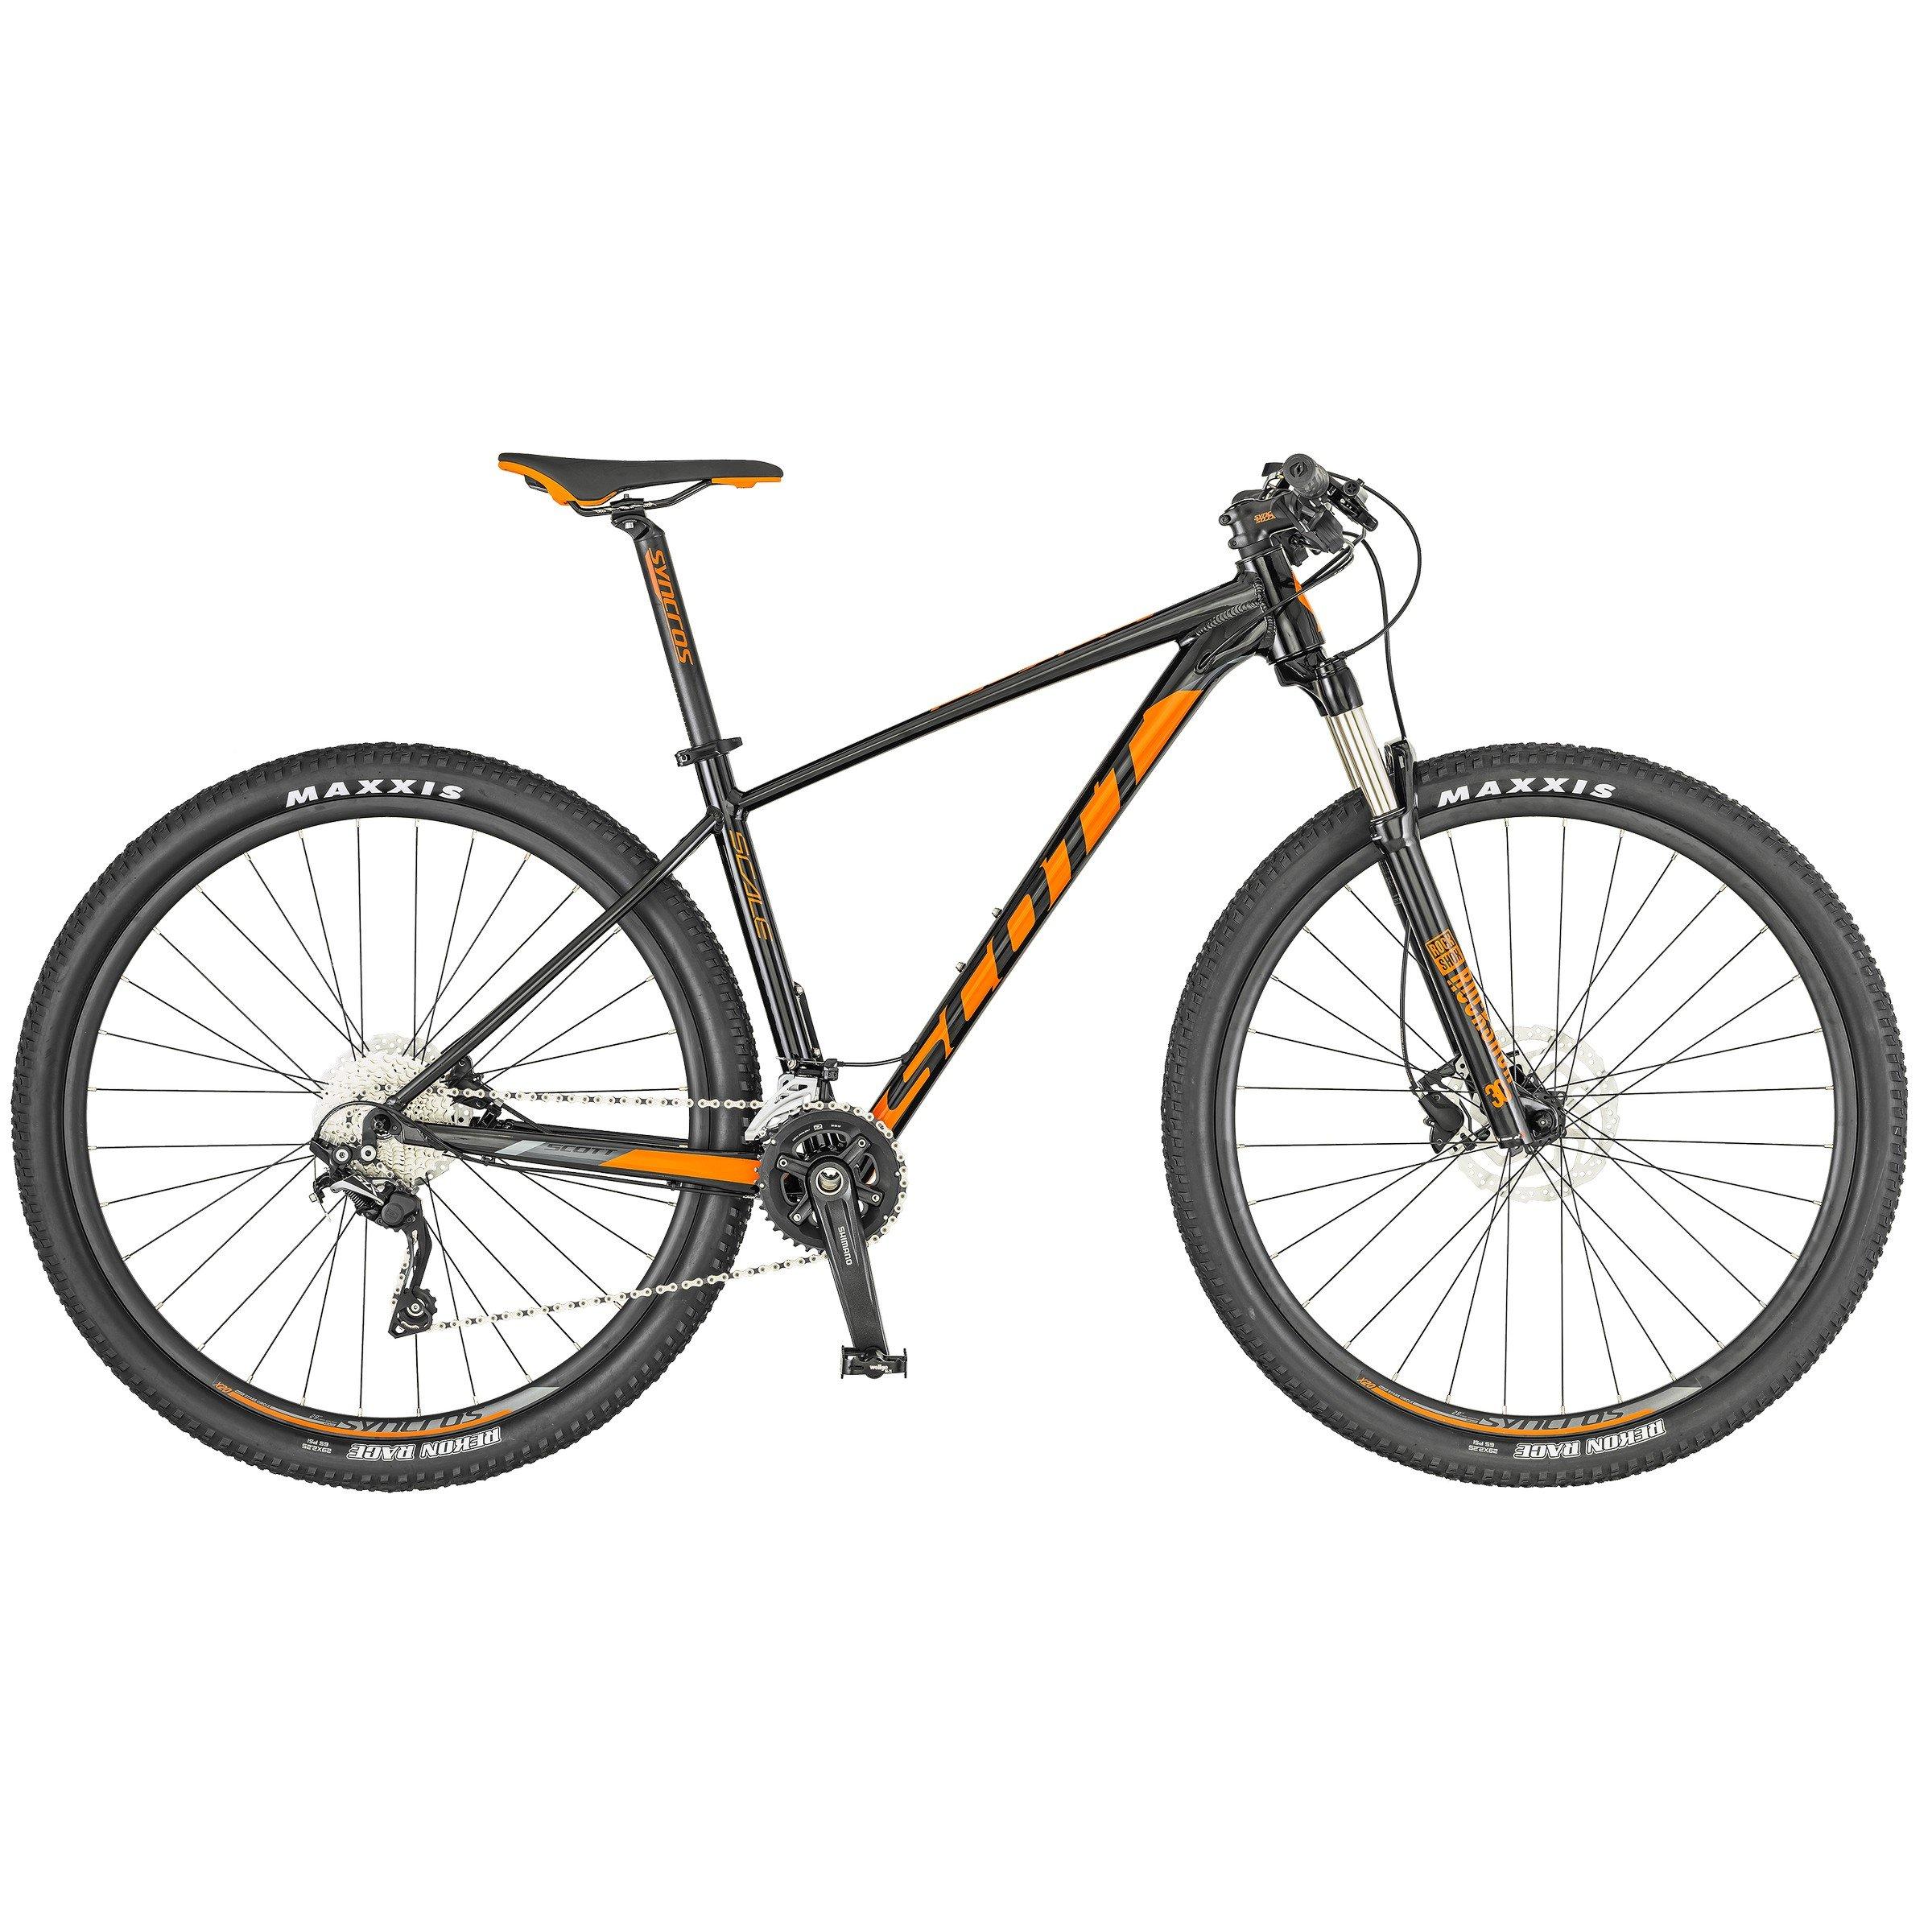 3dc6133f377 Scott Scale 970 - Pro Cyclery